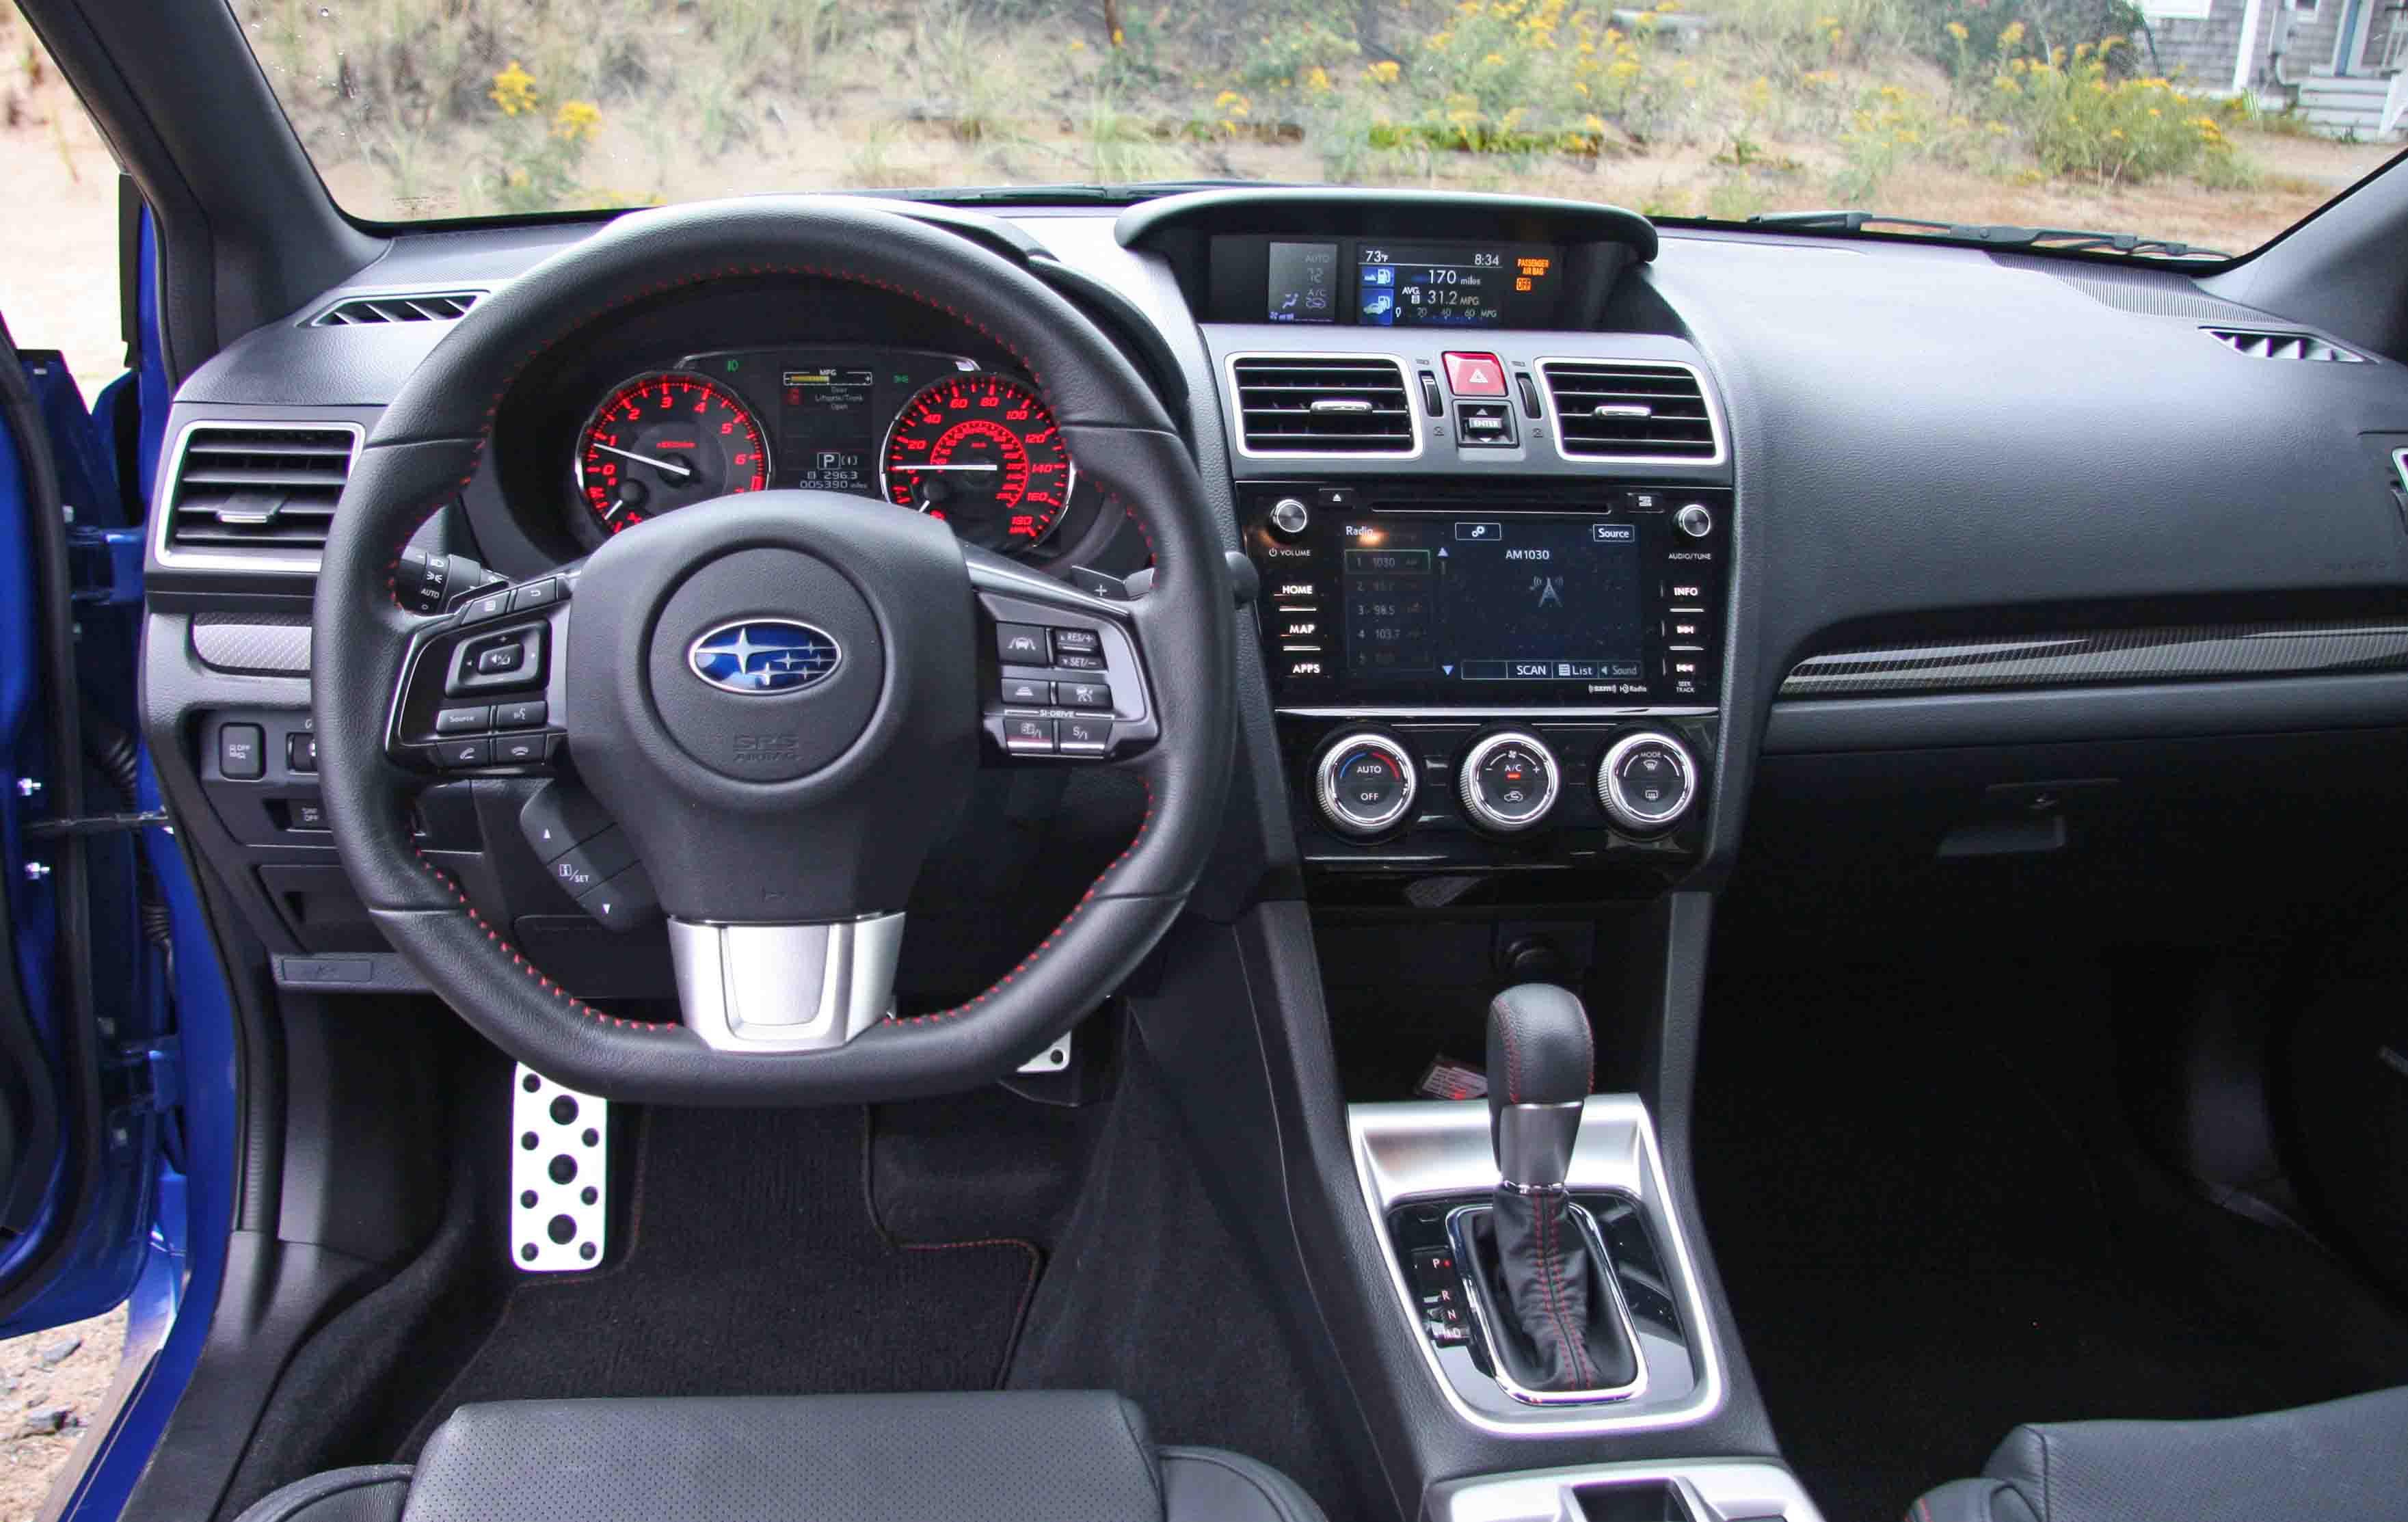 Subaru's WRX: Everything you want, except a clutch   Boston com